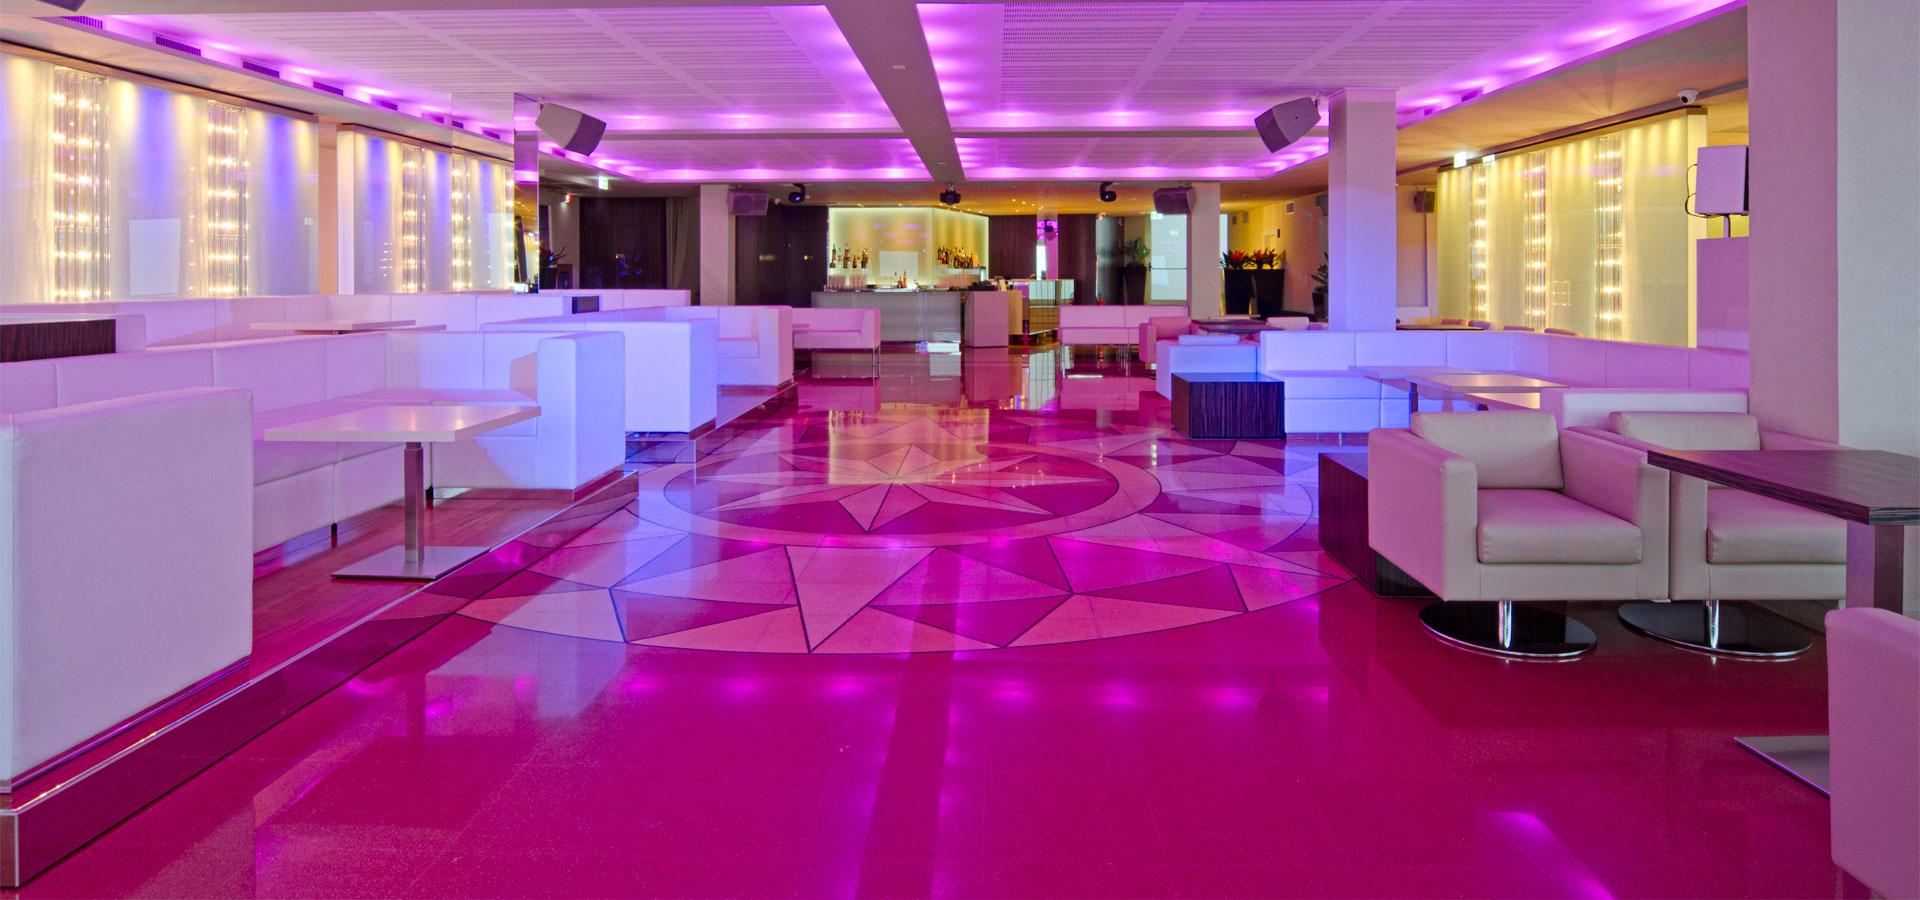 domingo-progettireferences_disco-dinner_rimini